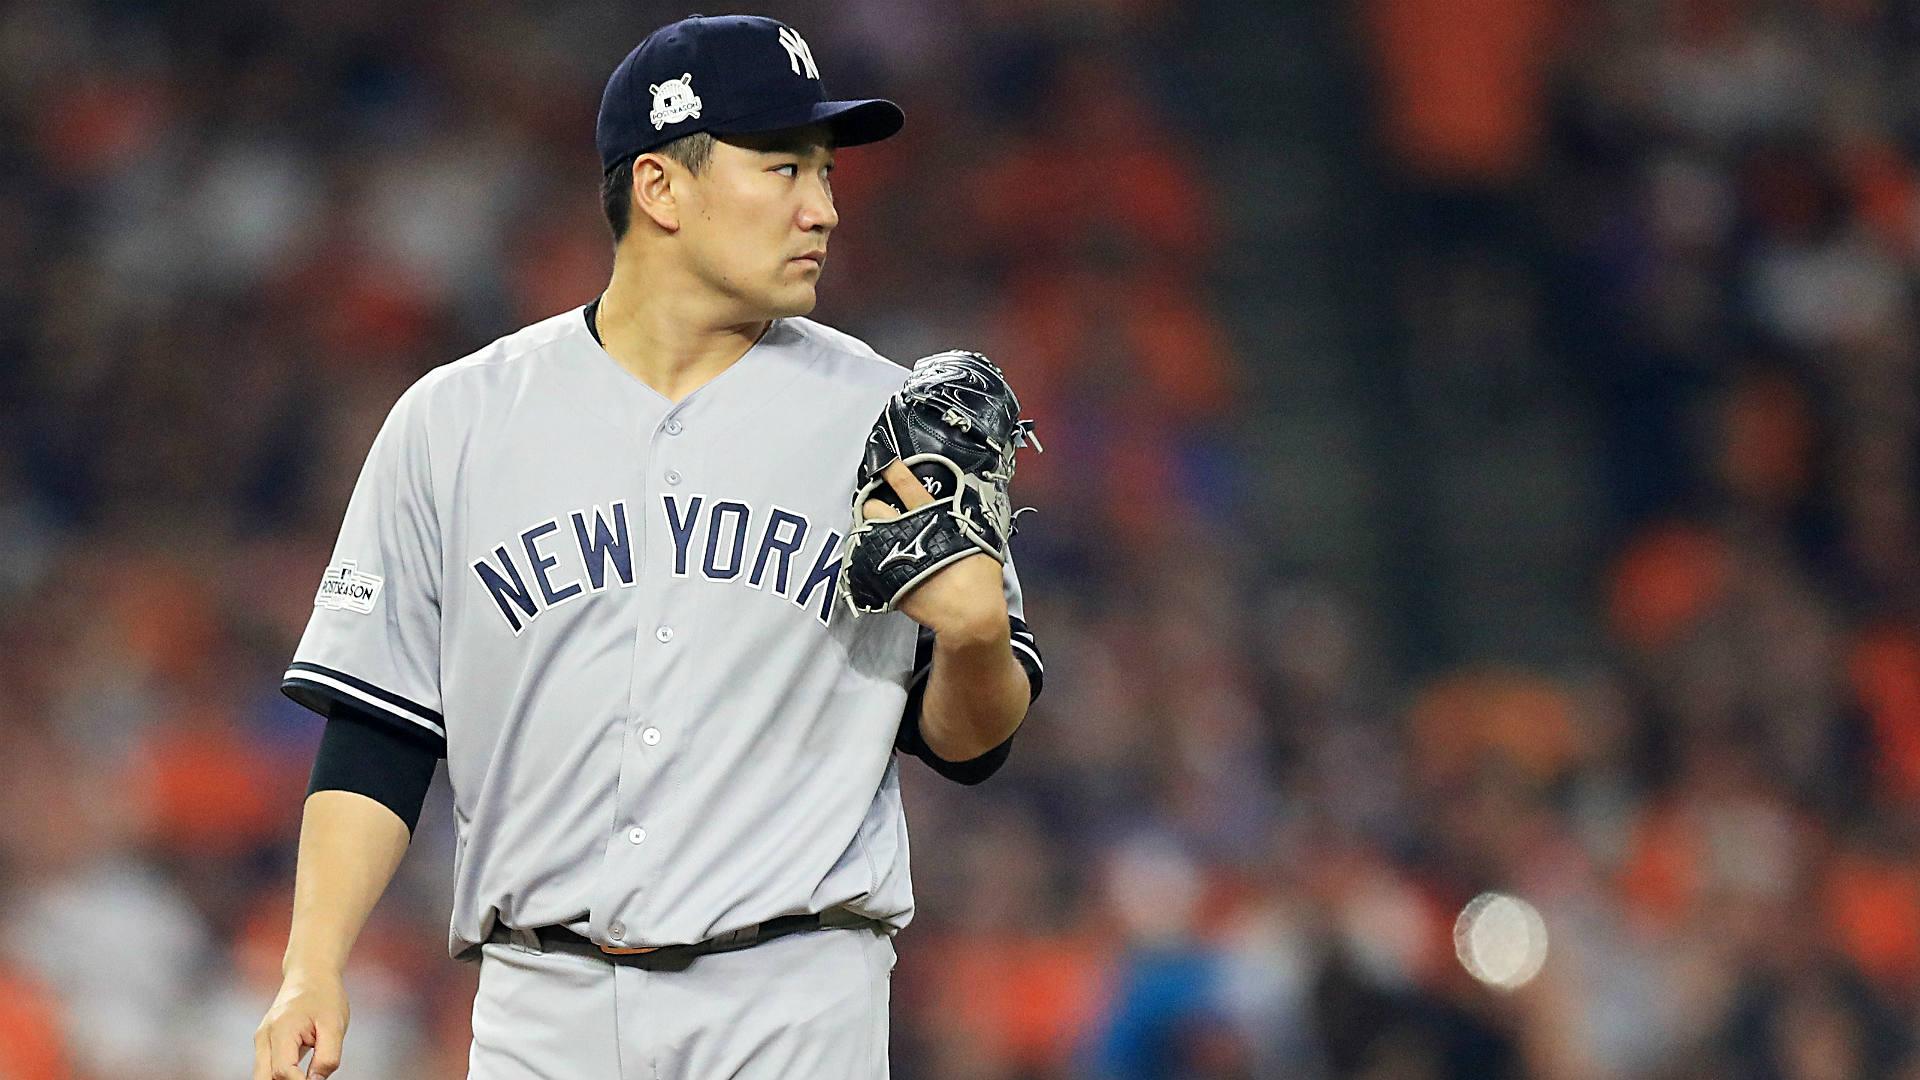 Masahiro Tanaka hit in head by Giancarlo Stanton line drive during Yankees camp 1